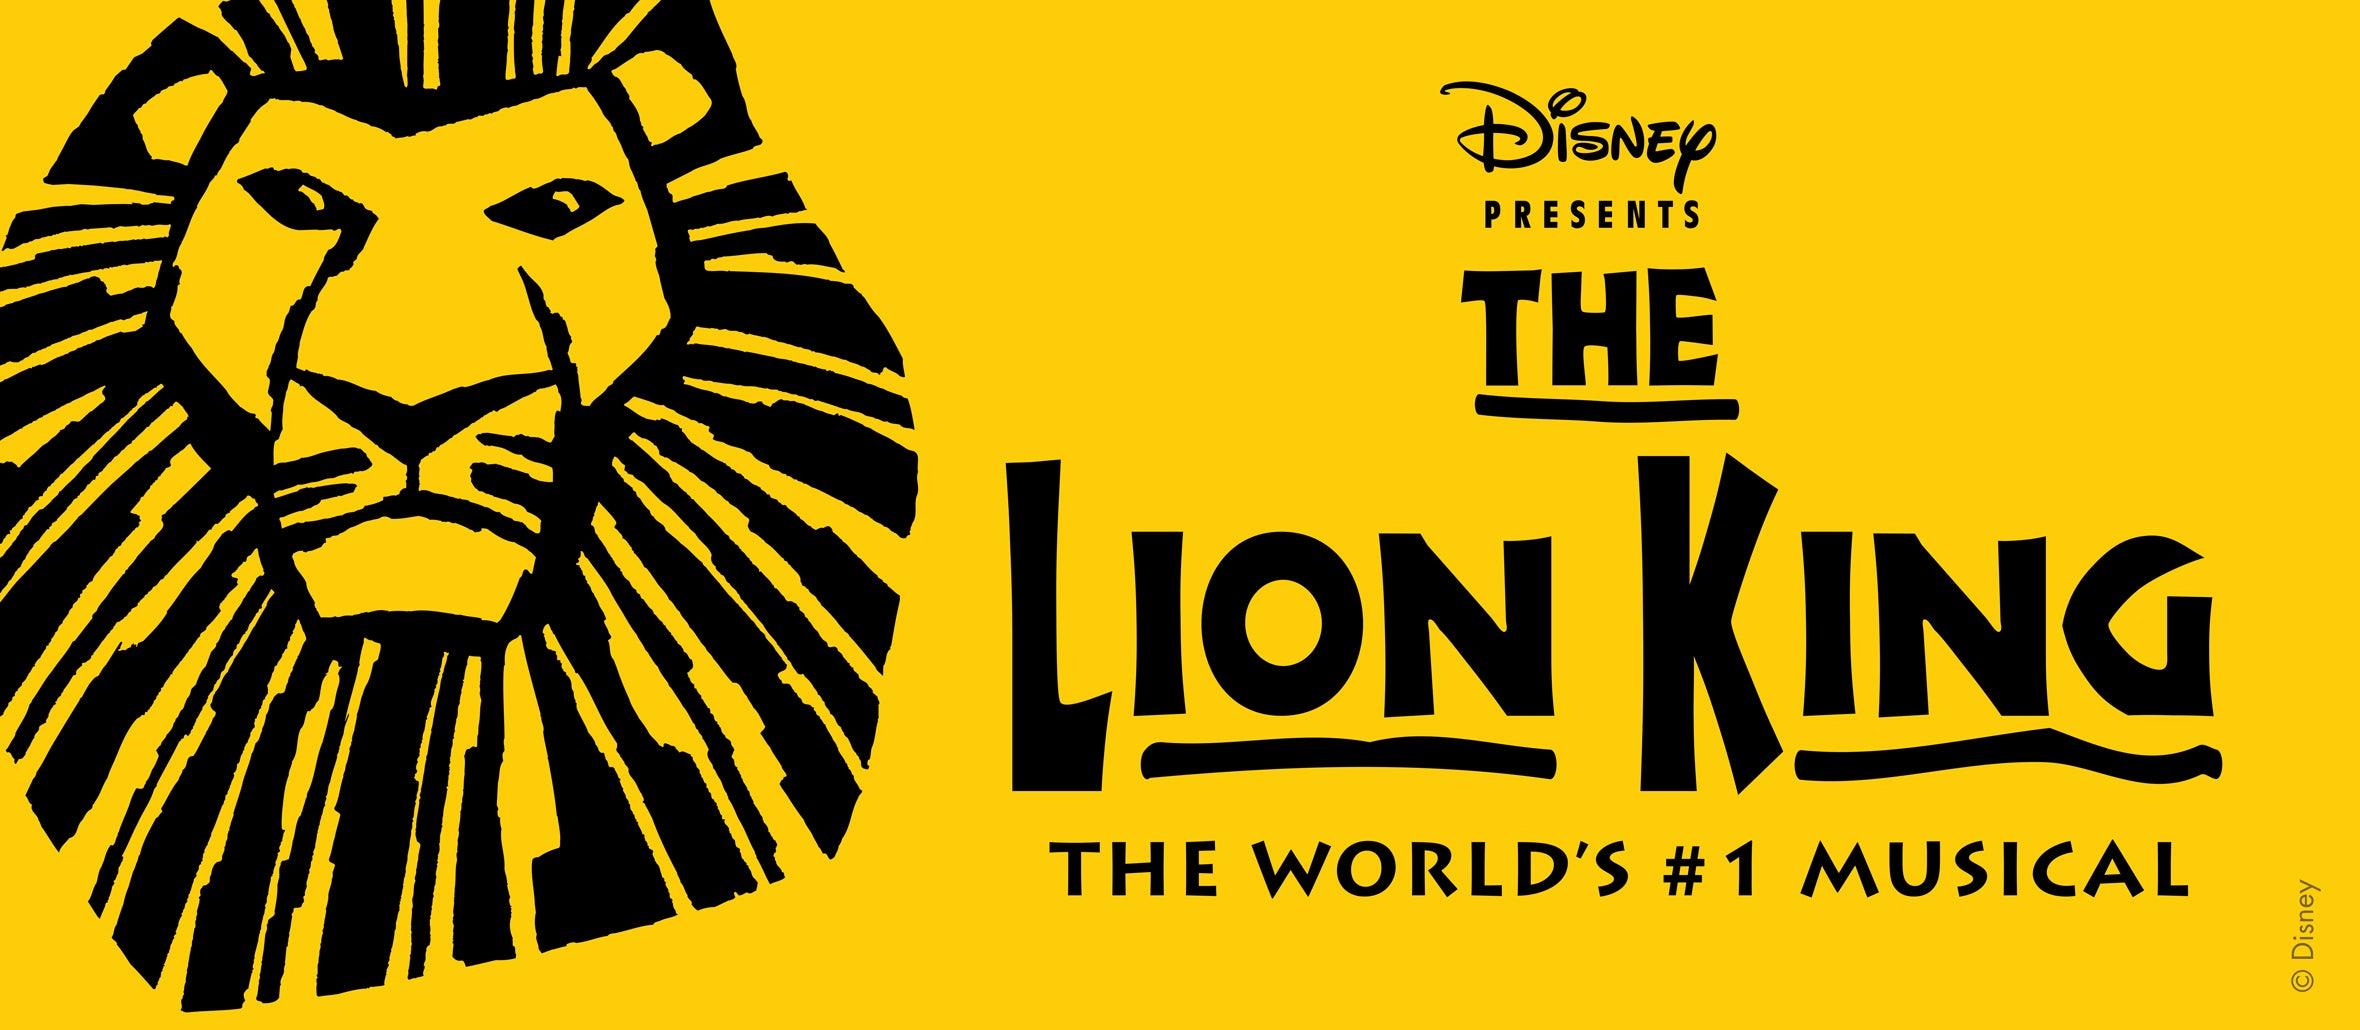 Disneys The Lion King Barbara B Mann Performing Arts Hall